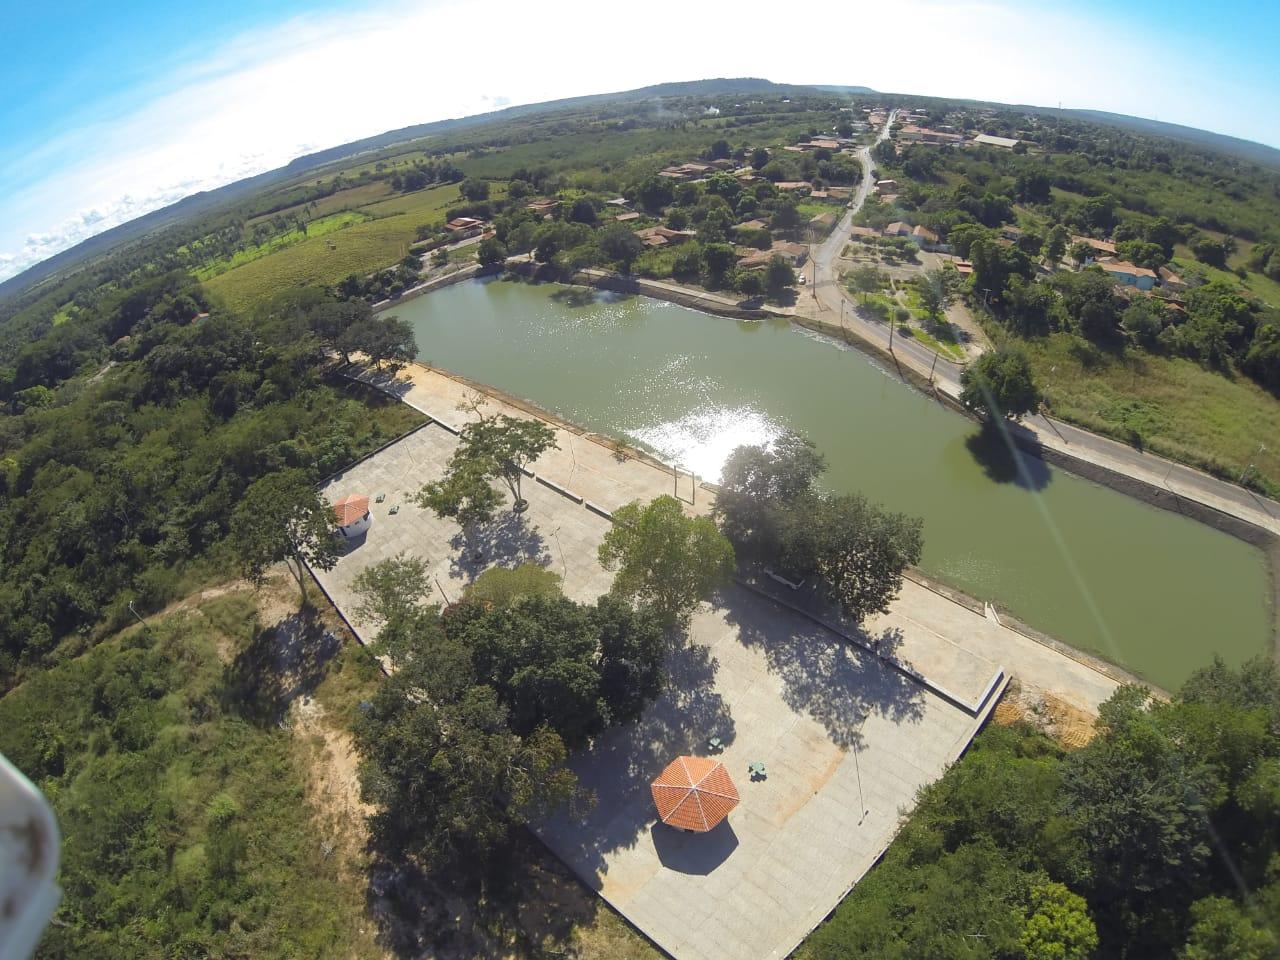 Orla da Lagoa na cidade de Agricolândia será inaugurada pelo Governador Wellington DiasOrla da Lagoa na cidade de Agricolândia será inaugurada pelo Governador Wellington Dias